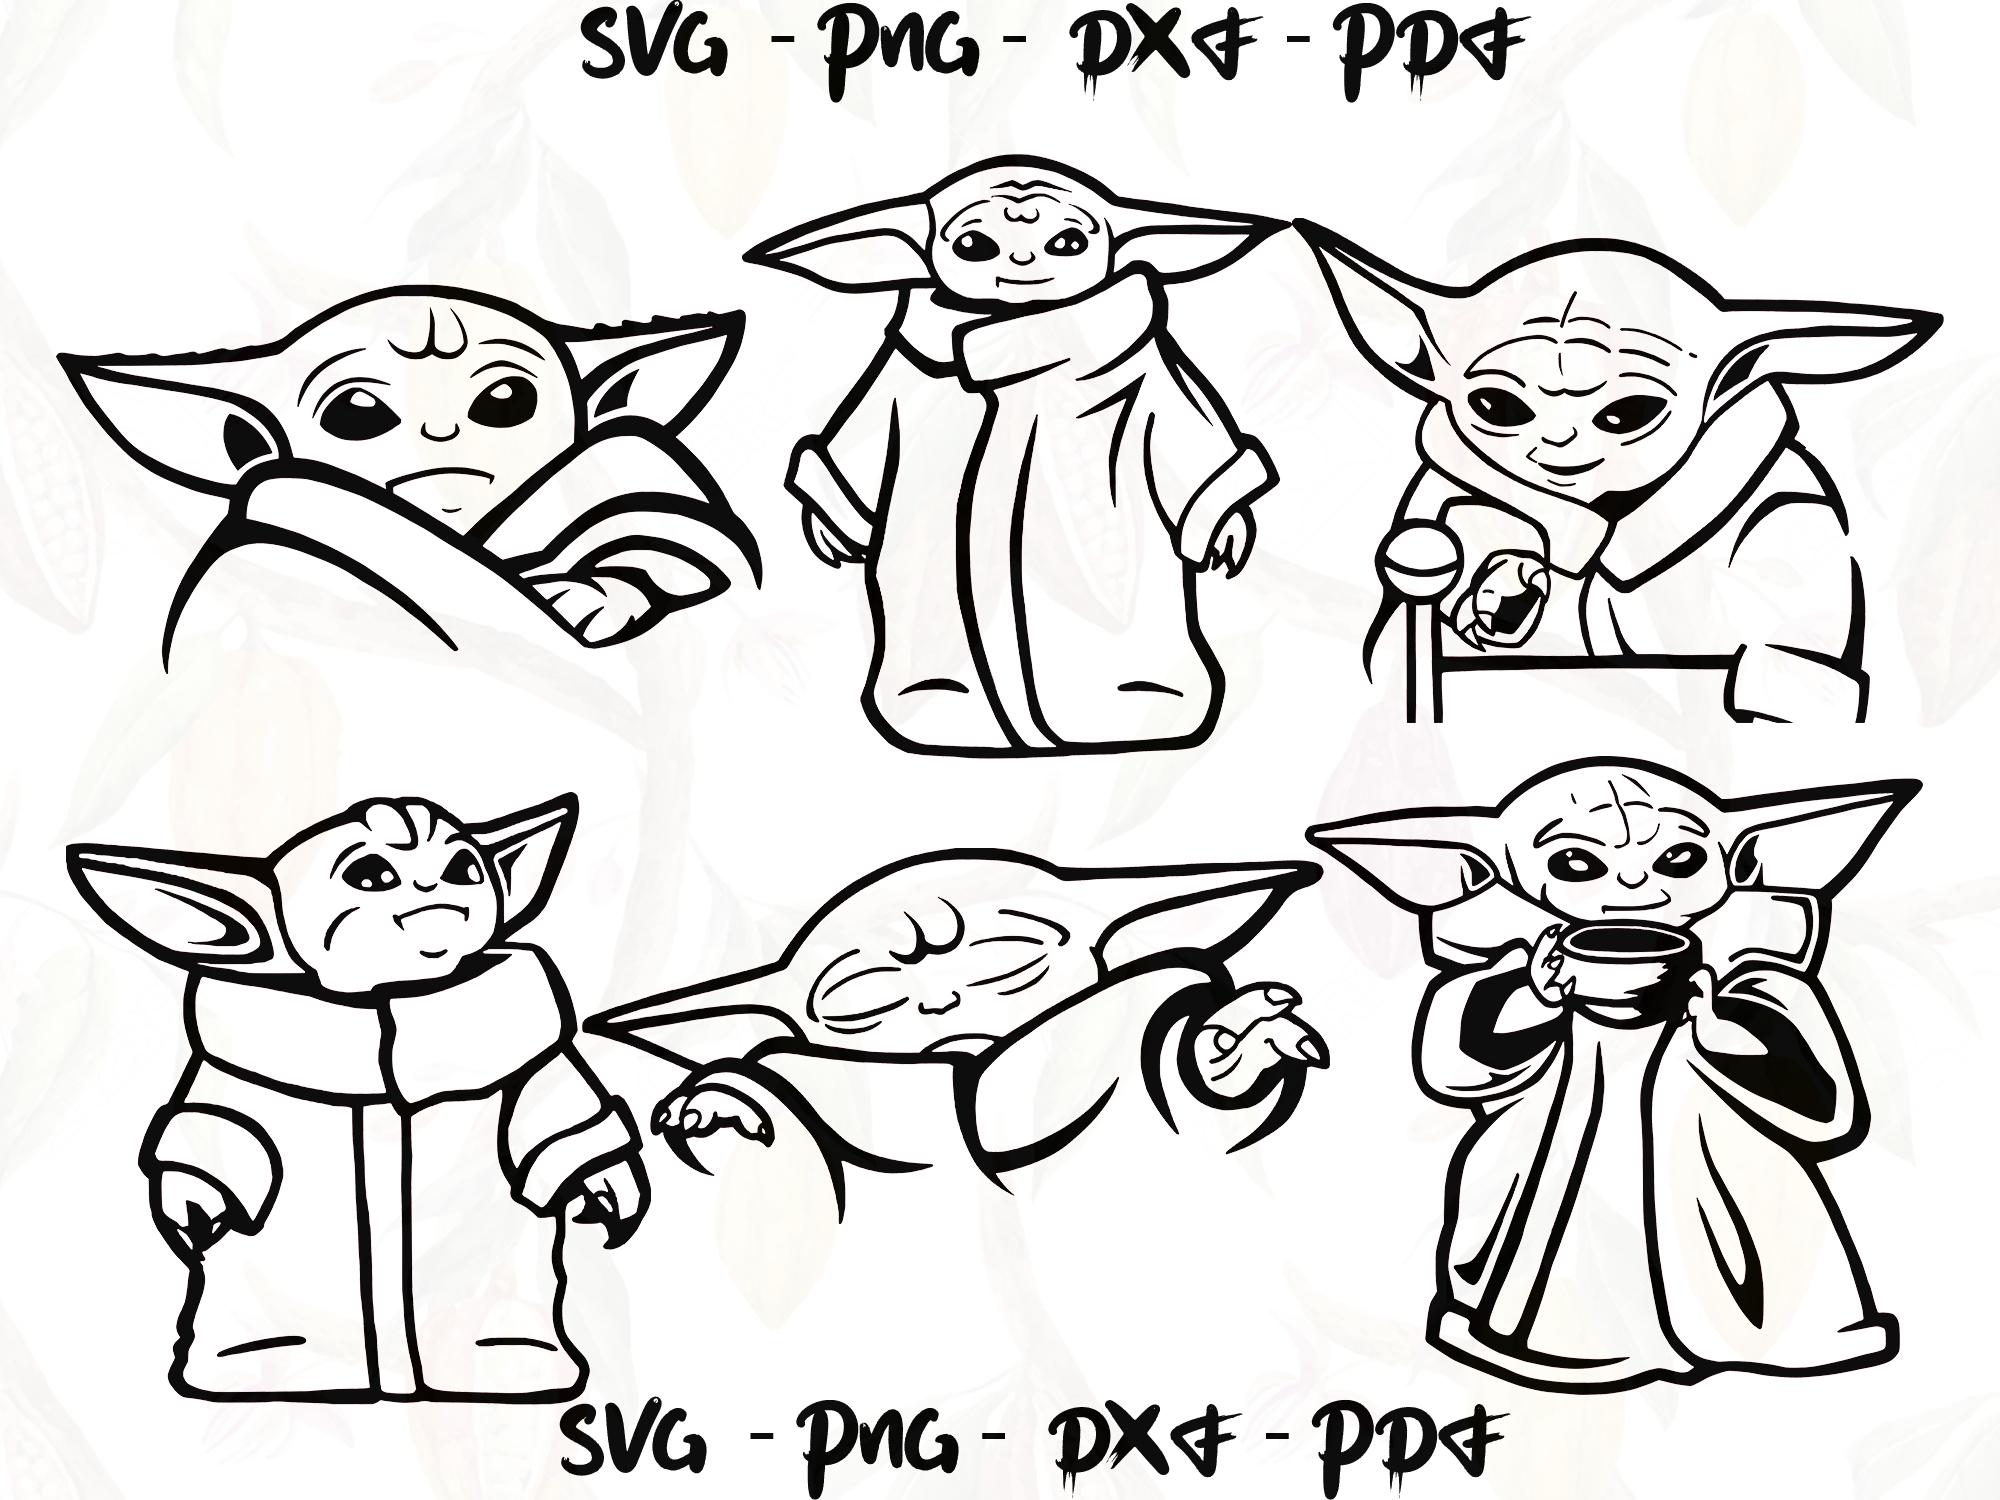 Baby Yoda Svg Bundles Luke Skywalker Svg Star Wars Svg Star Wars T Shirt Star Wars Print Star Wars Seagulls Yoda Svg Yoda Print Yoda Star Wars Svg Baby Star Wars Drawings